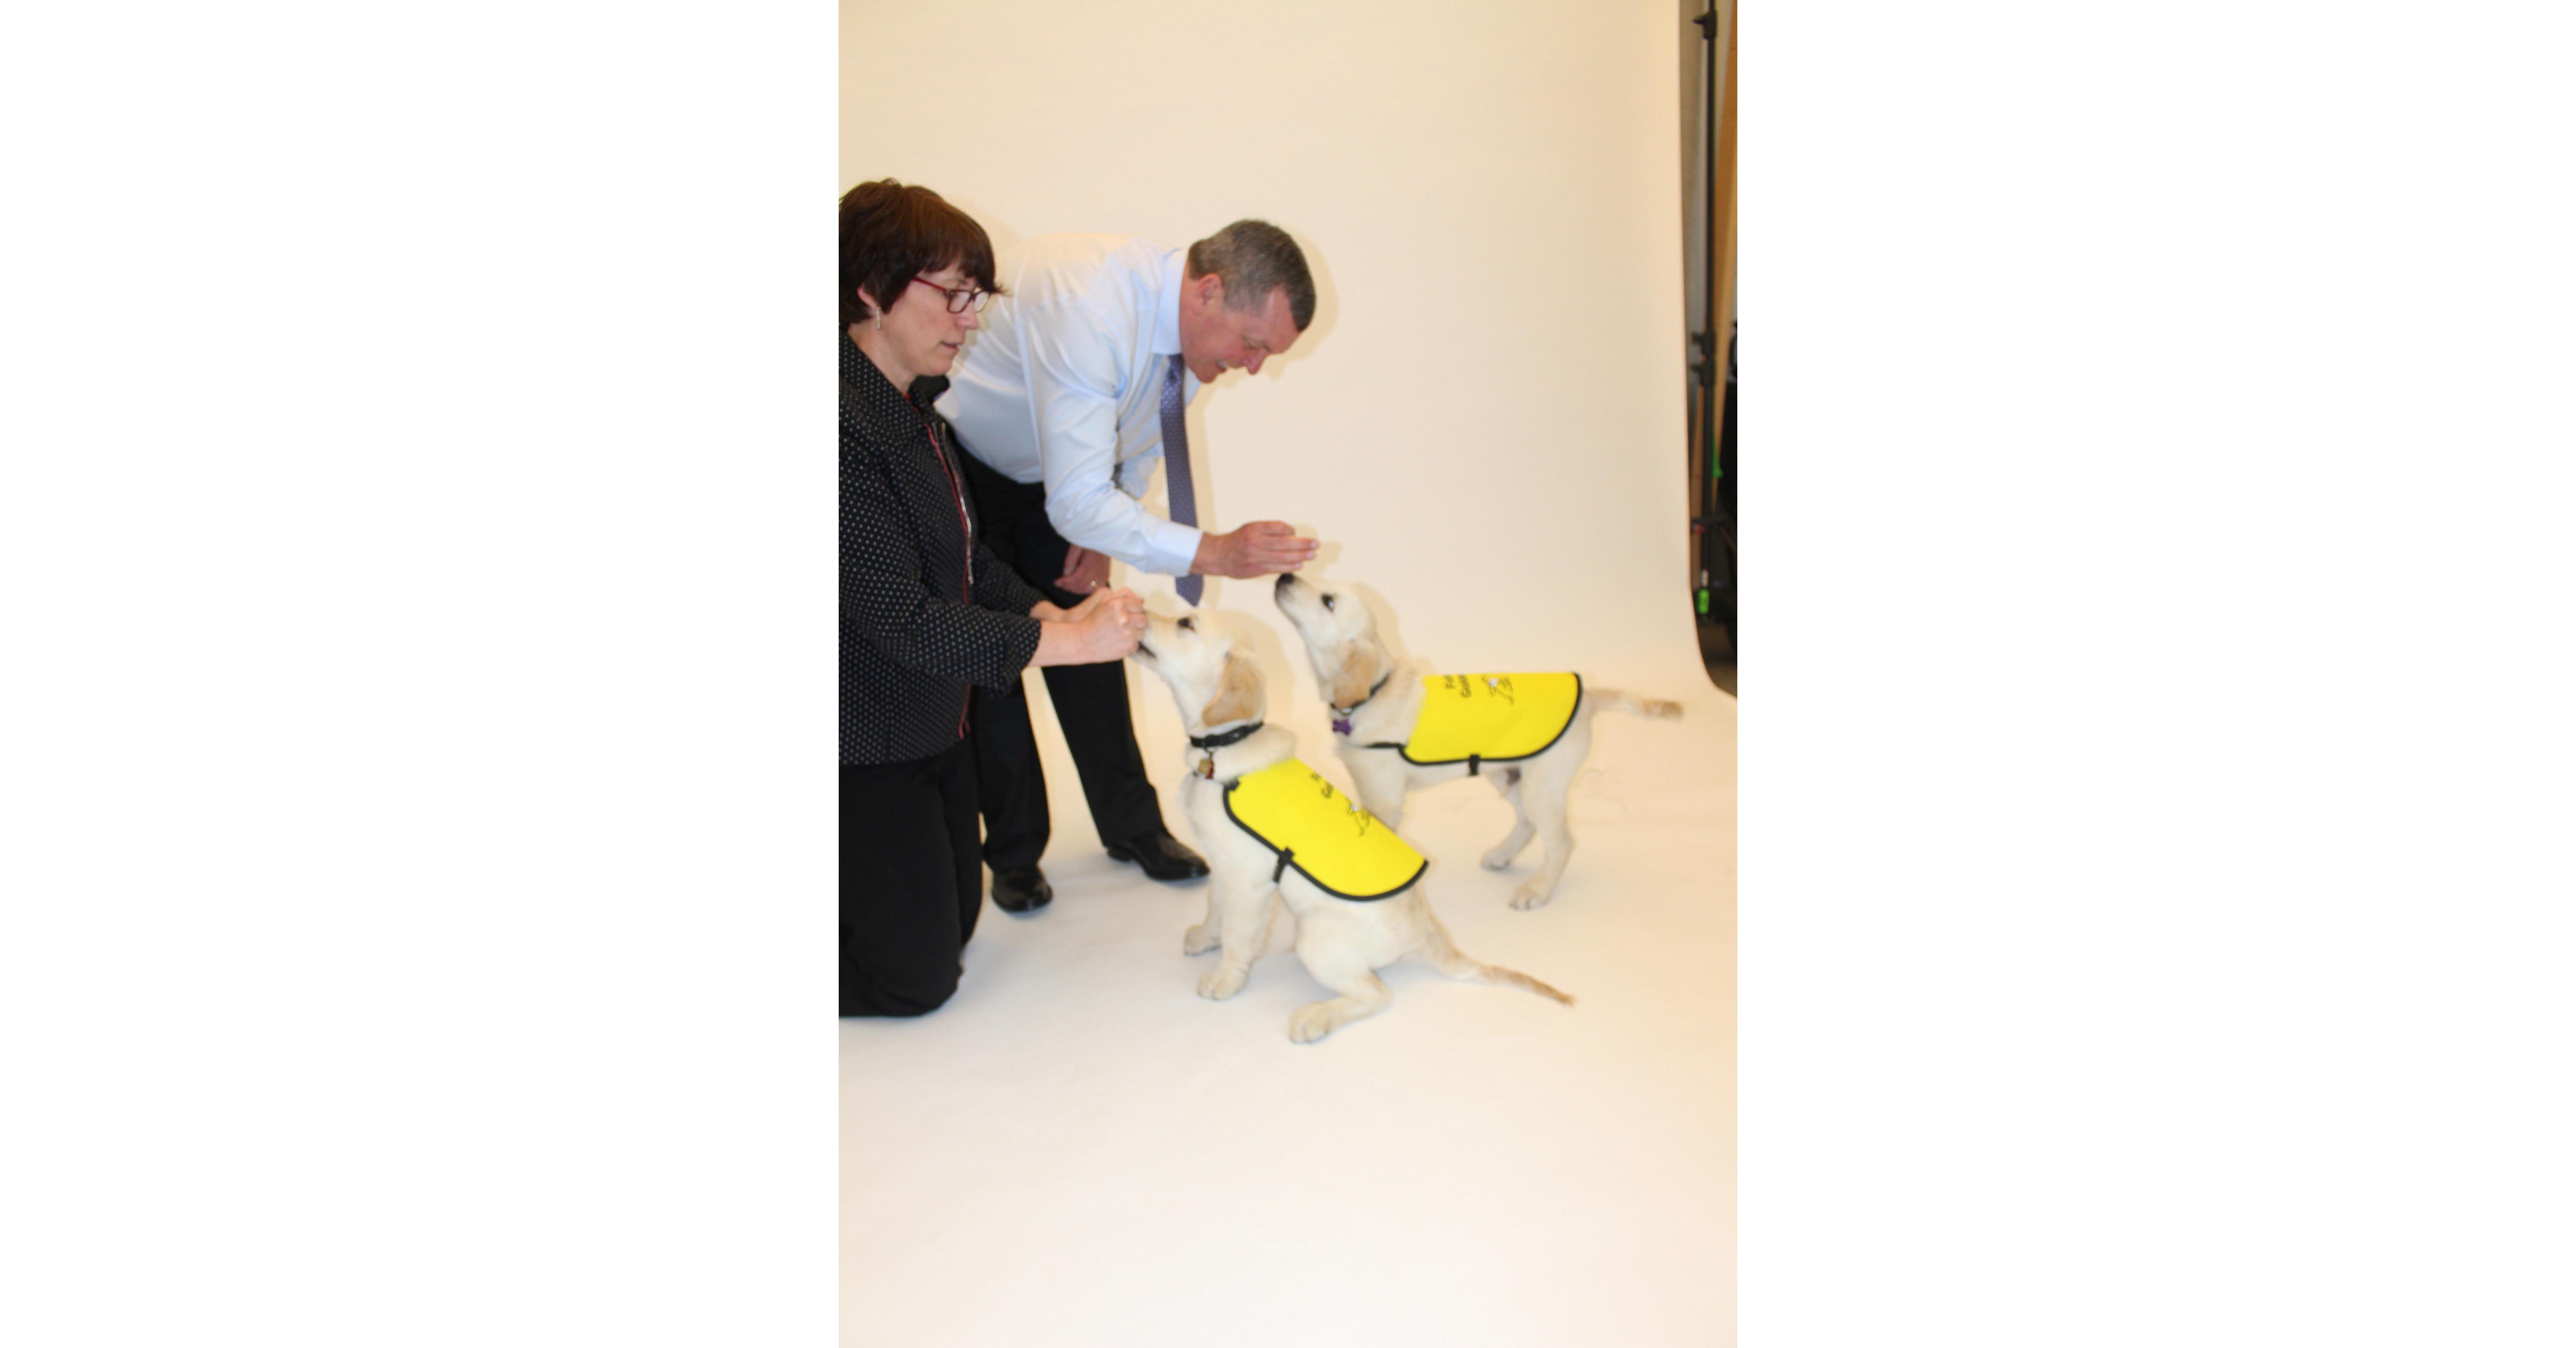 Cnib Guide Dog Training Program